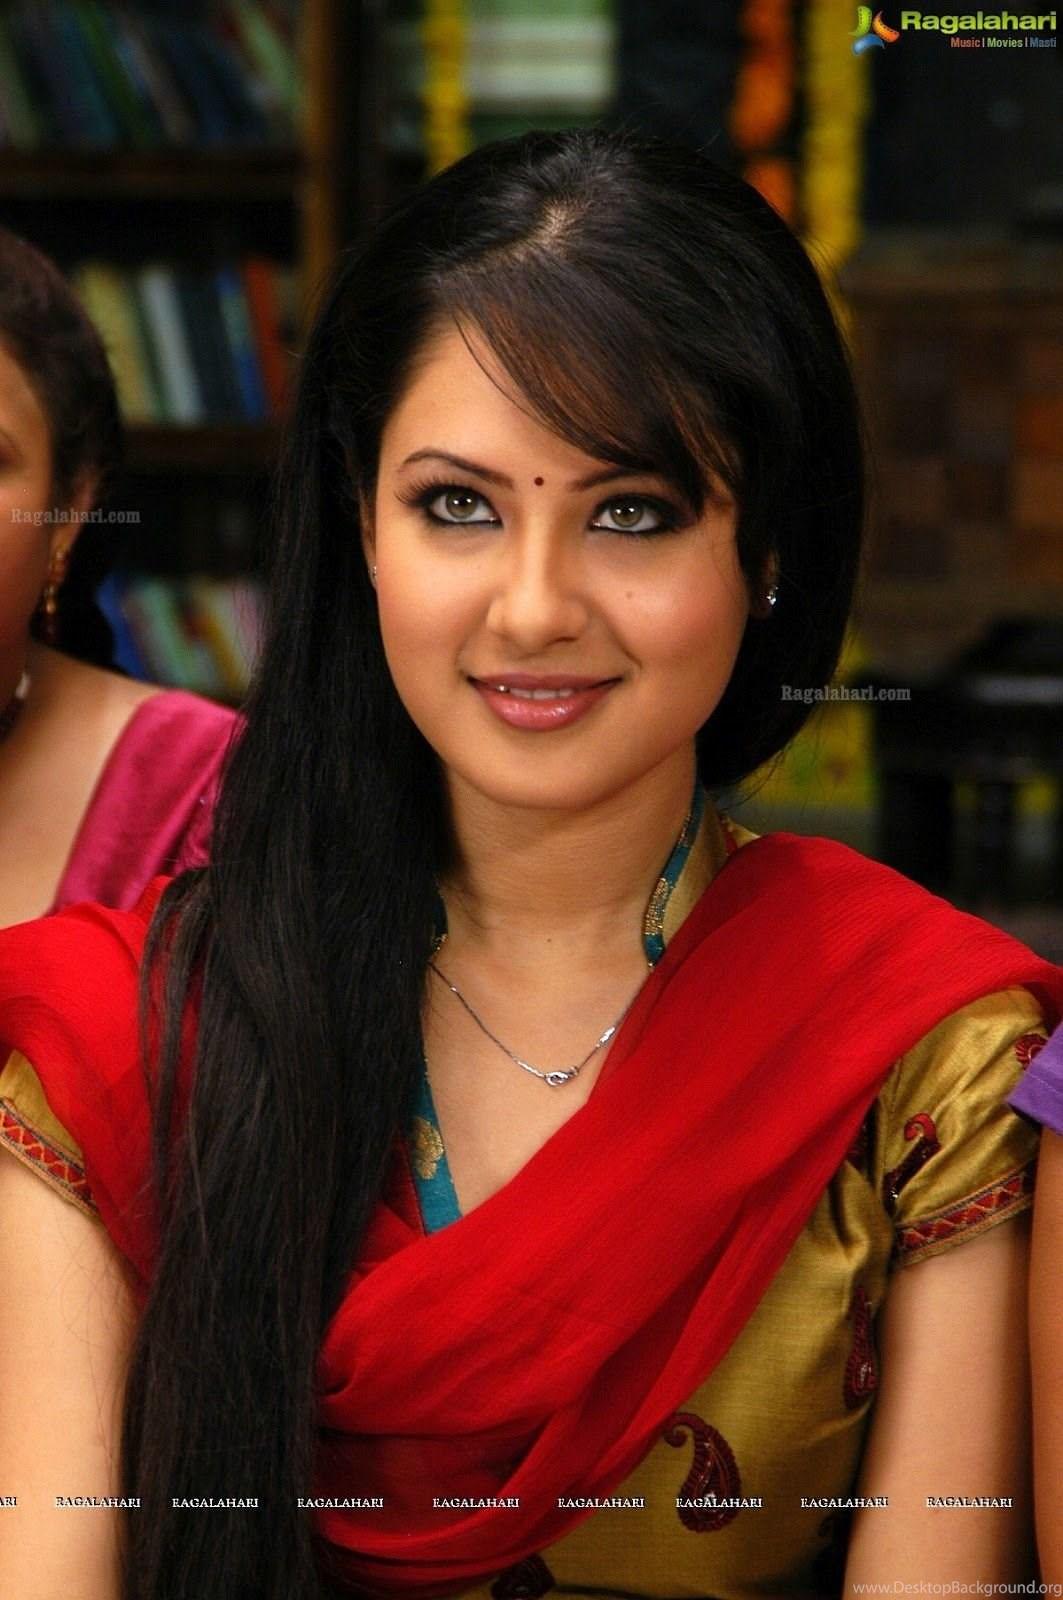 Actress Pooja Umashankar 2016 Latest Cute & Hot Gallery